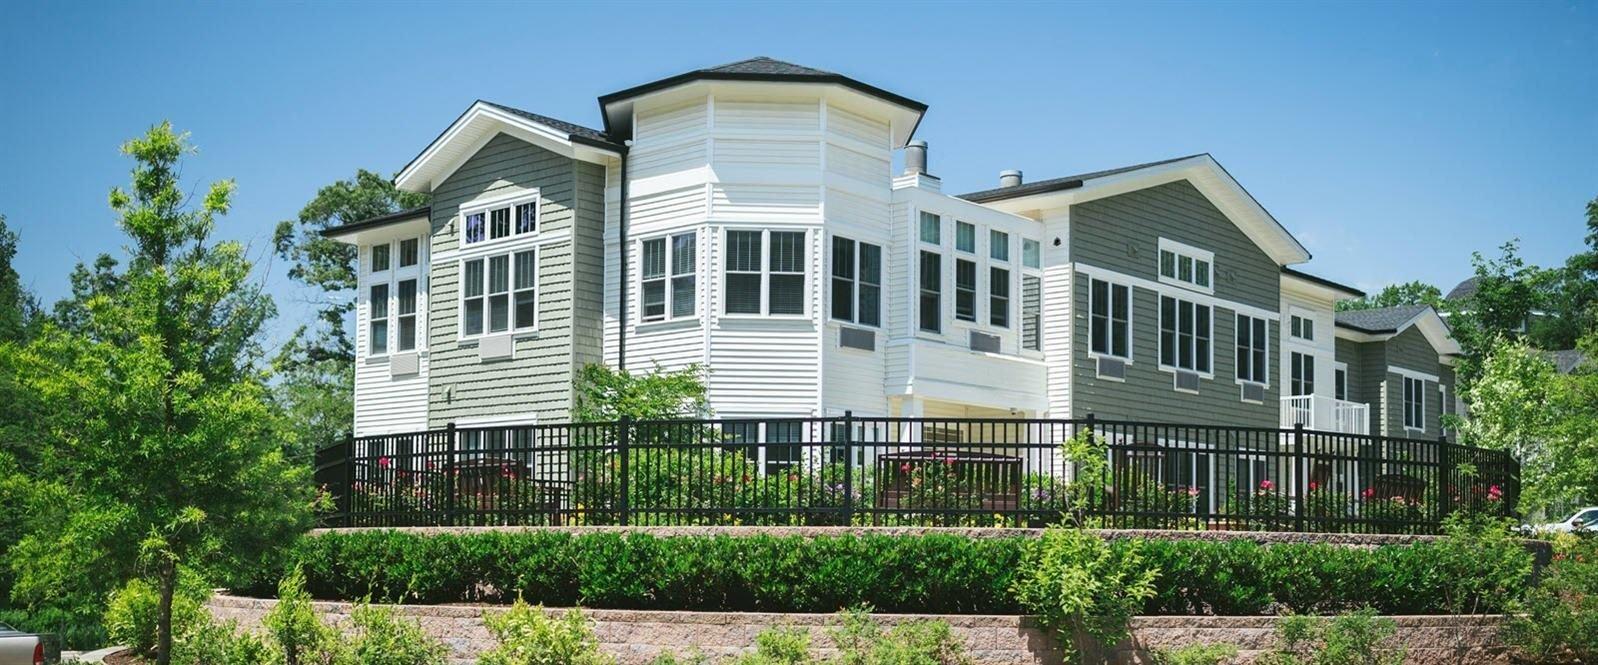 Elegant Exterior View Of Property at Spring Arbor of Severna Park, Severna Park, MD, 21146